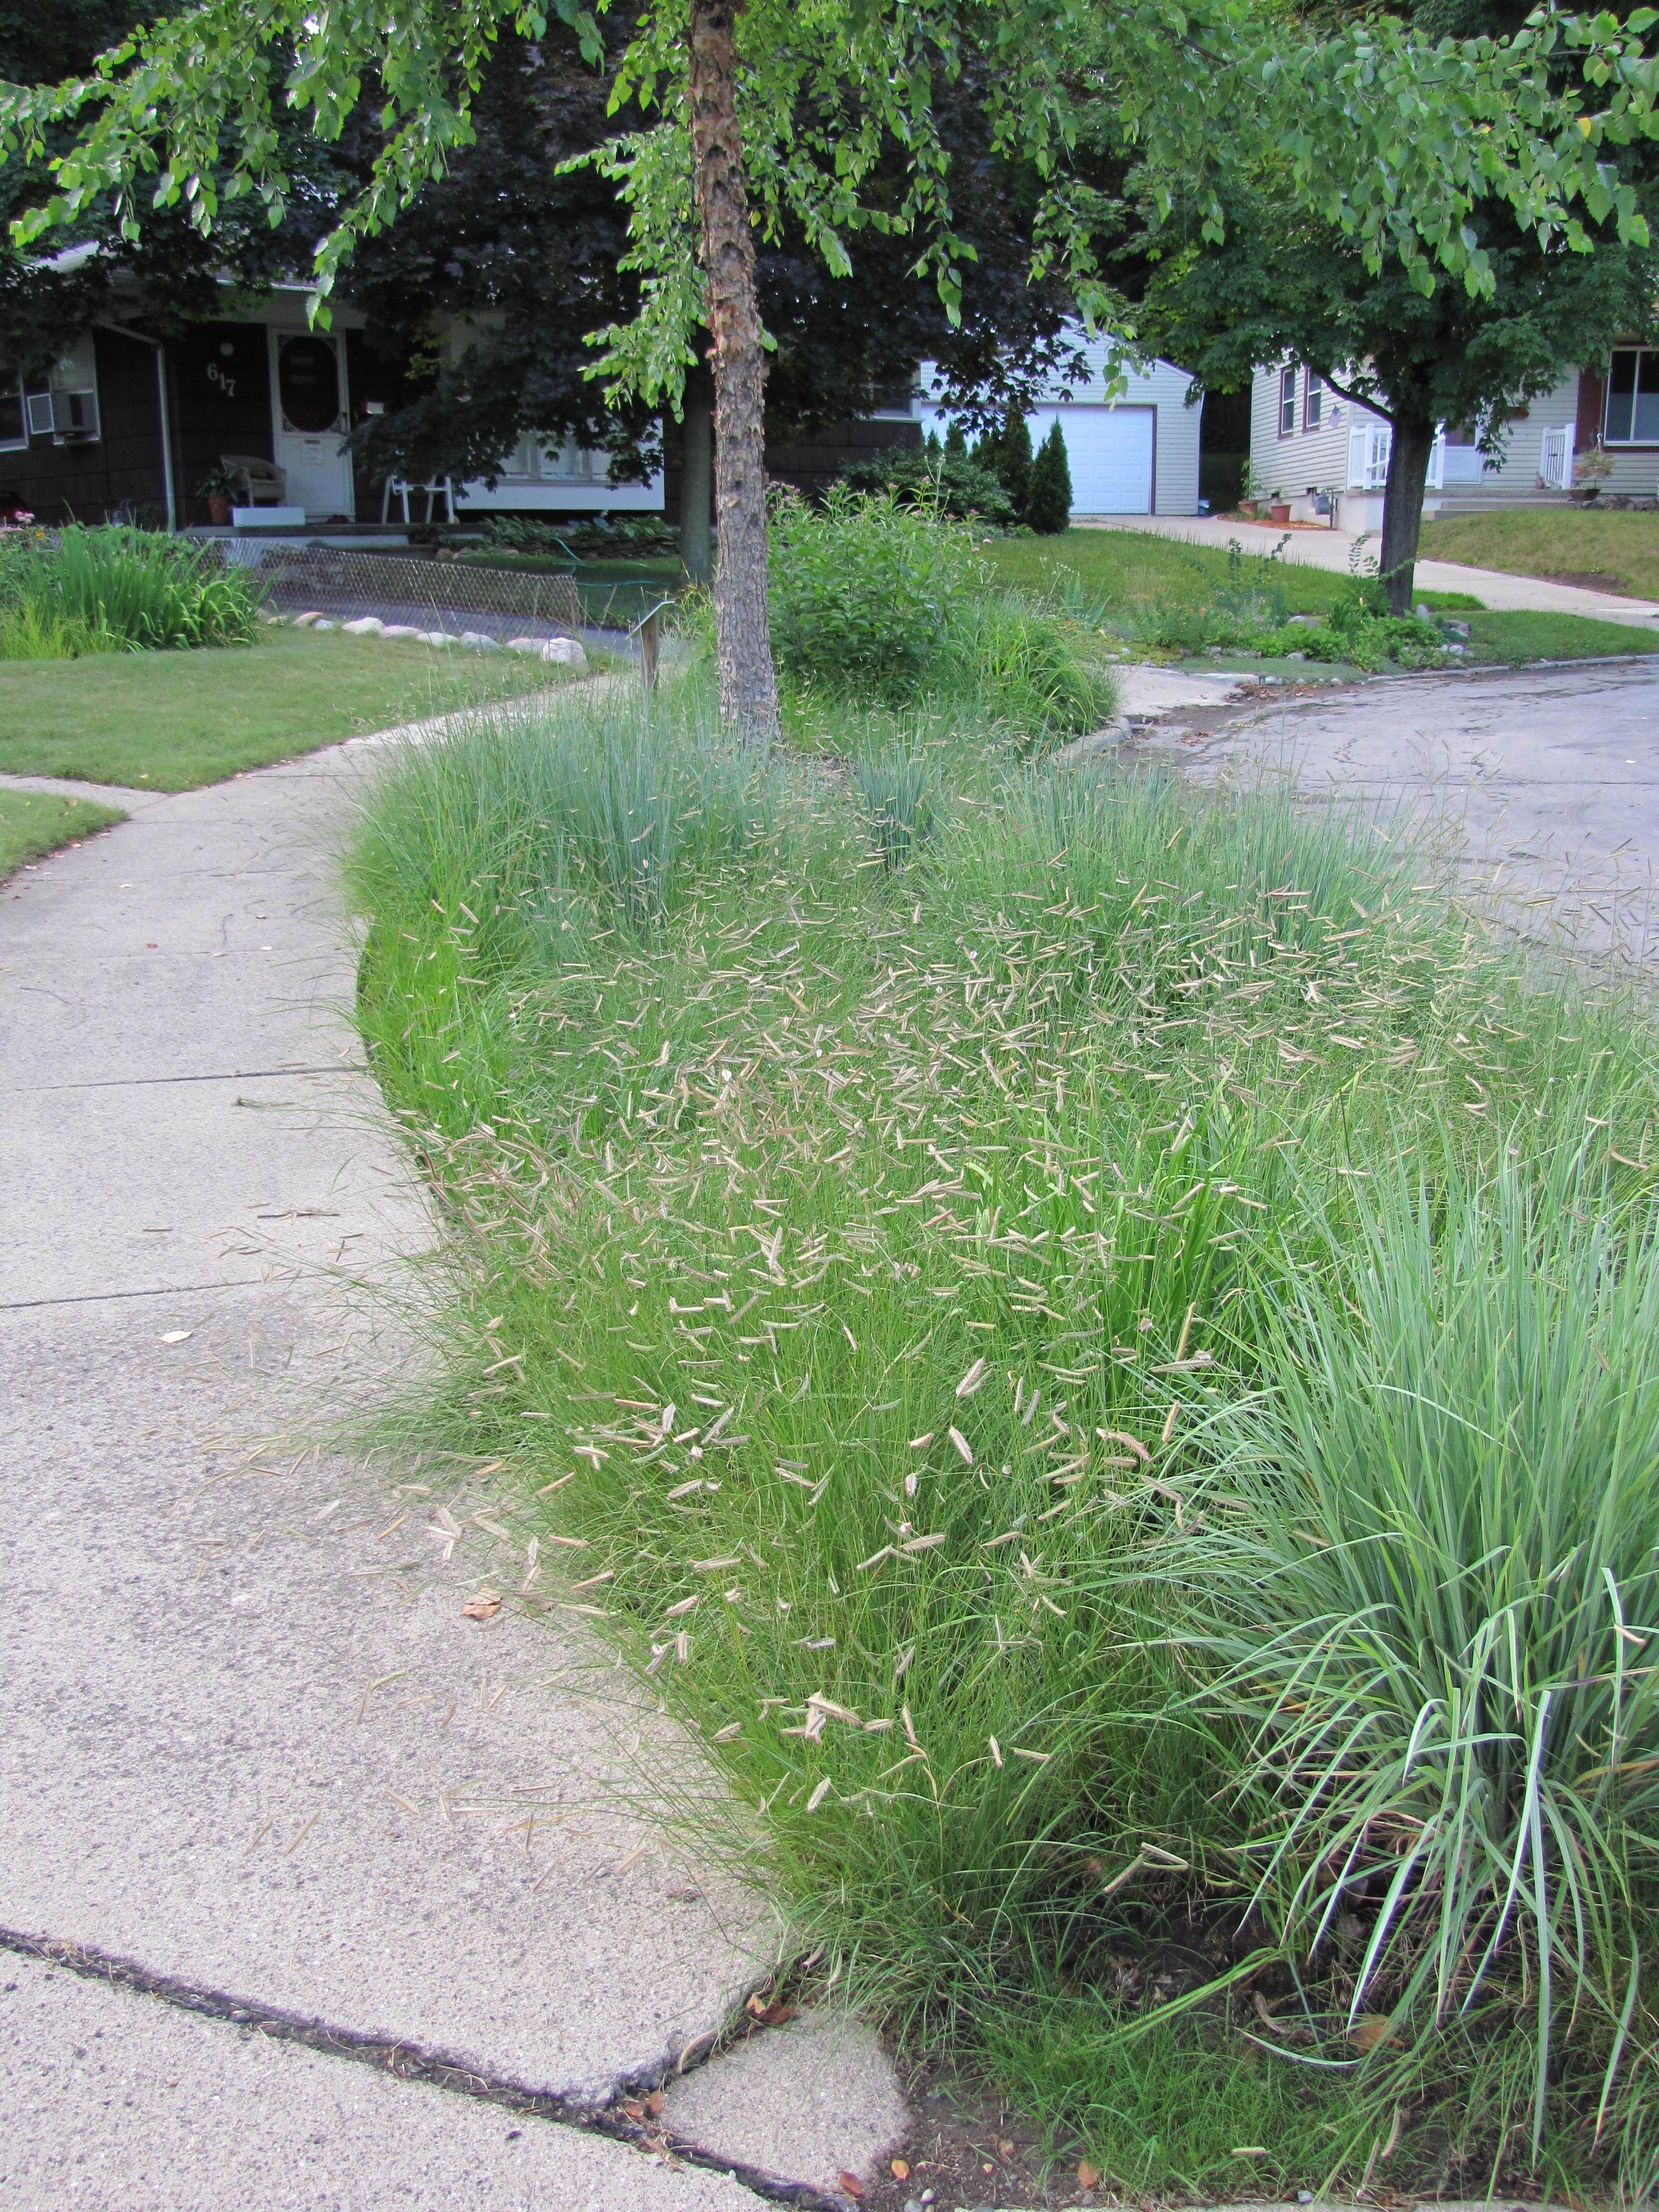 Short Michigan Native Prairie Gres Lawn Extension Next To Road